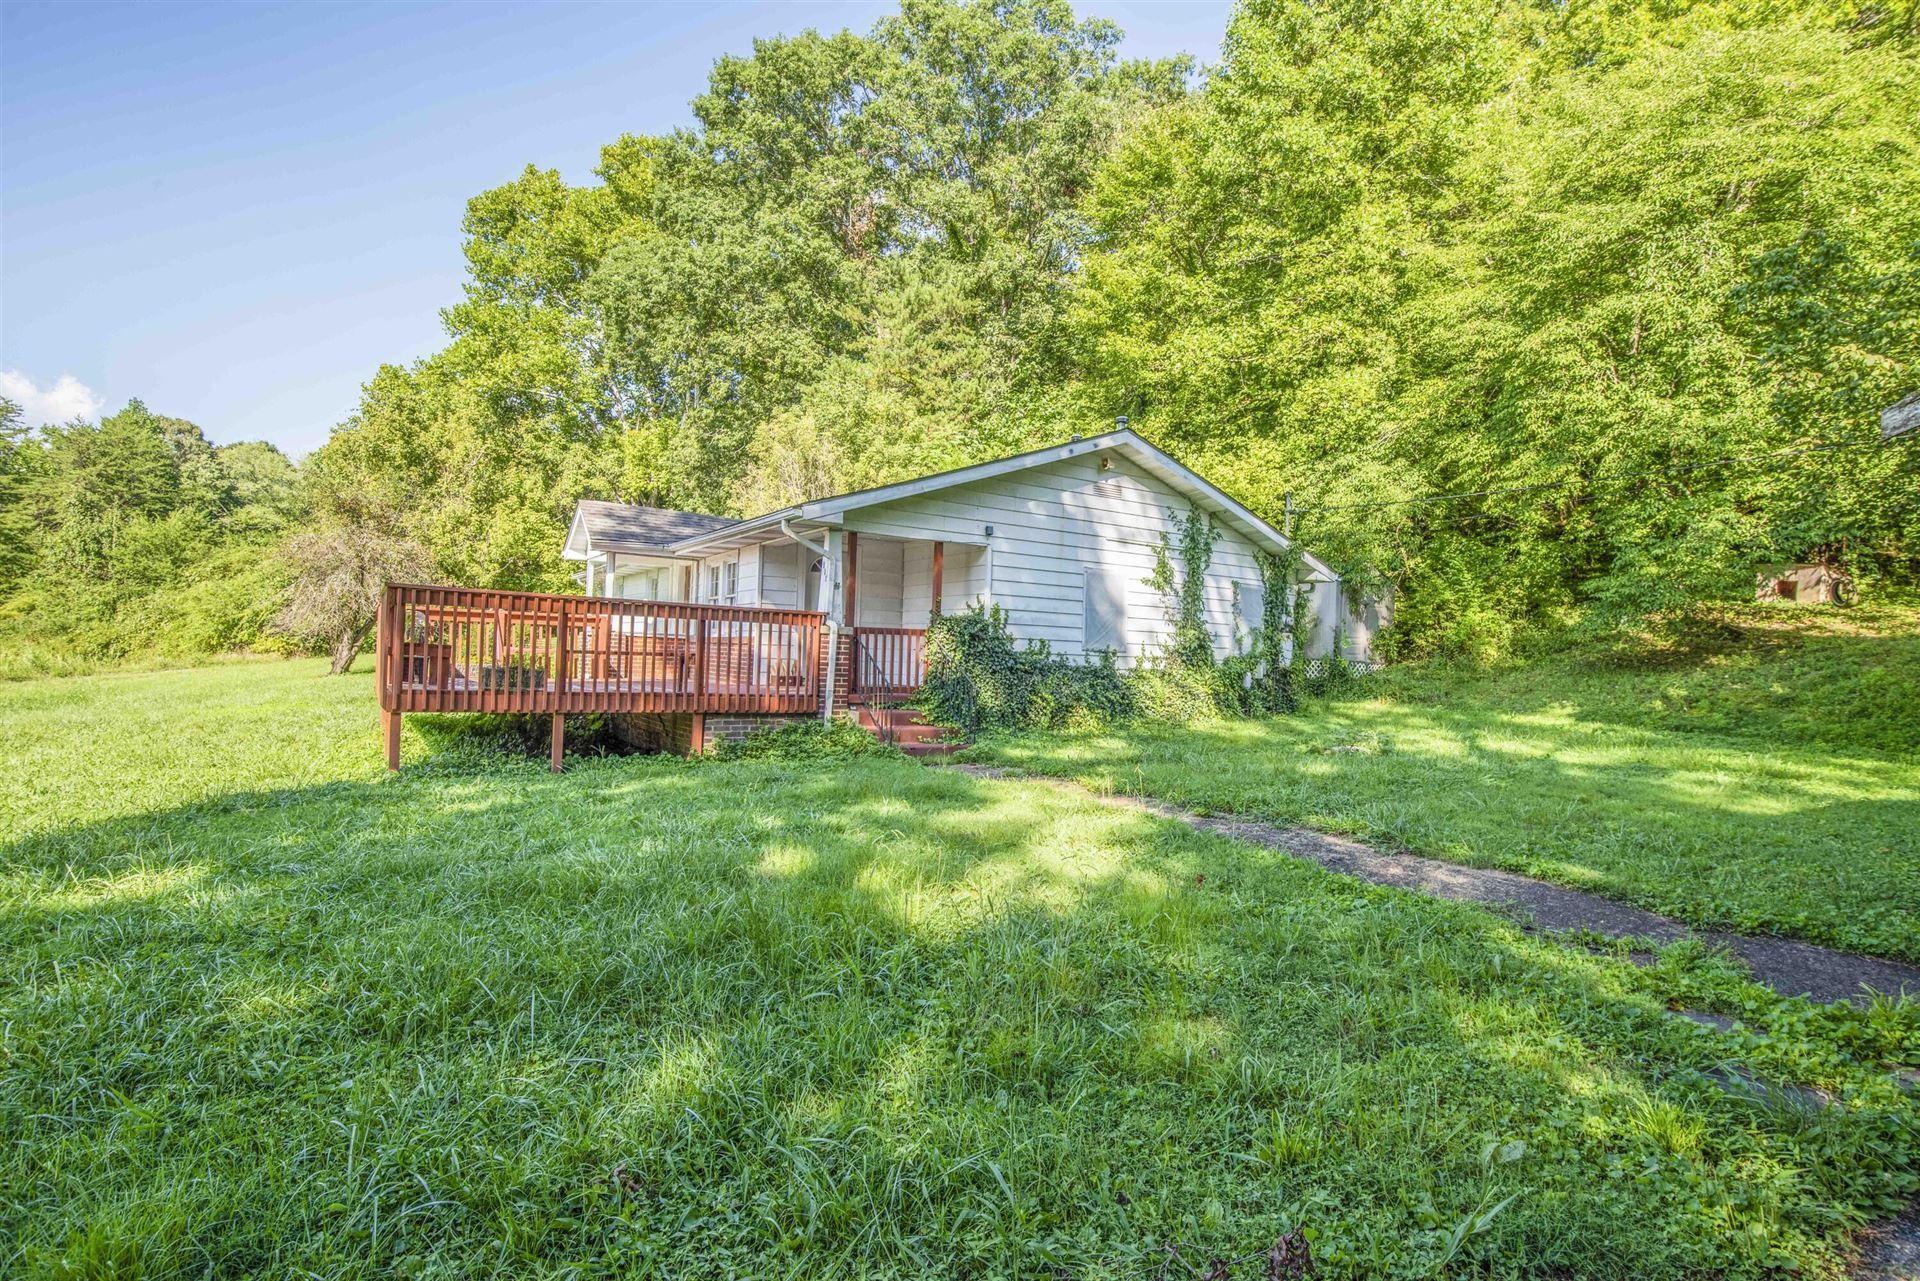 Photo of 679 Blockhouse Valley Rd, Clinton, TN 37716 (MLS # 1165318)